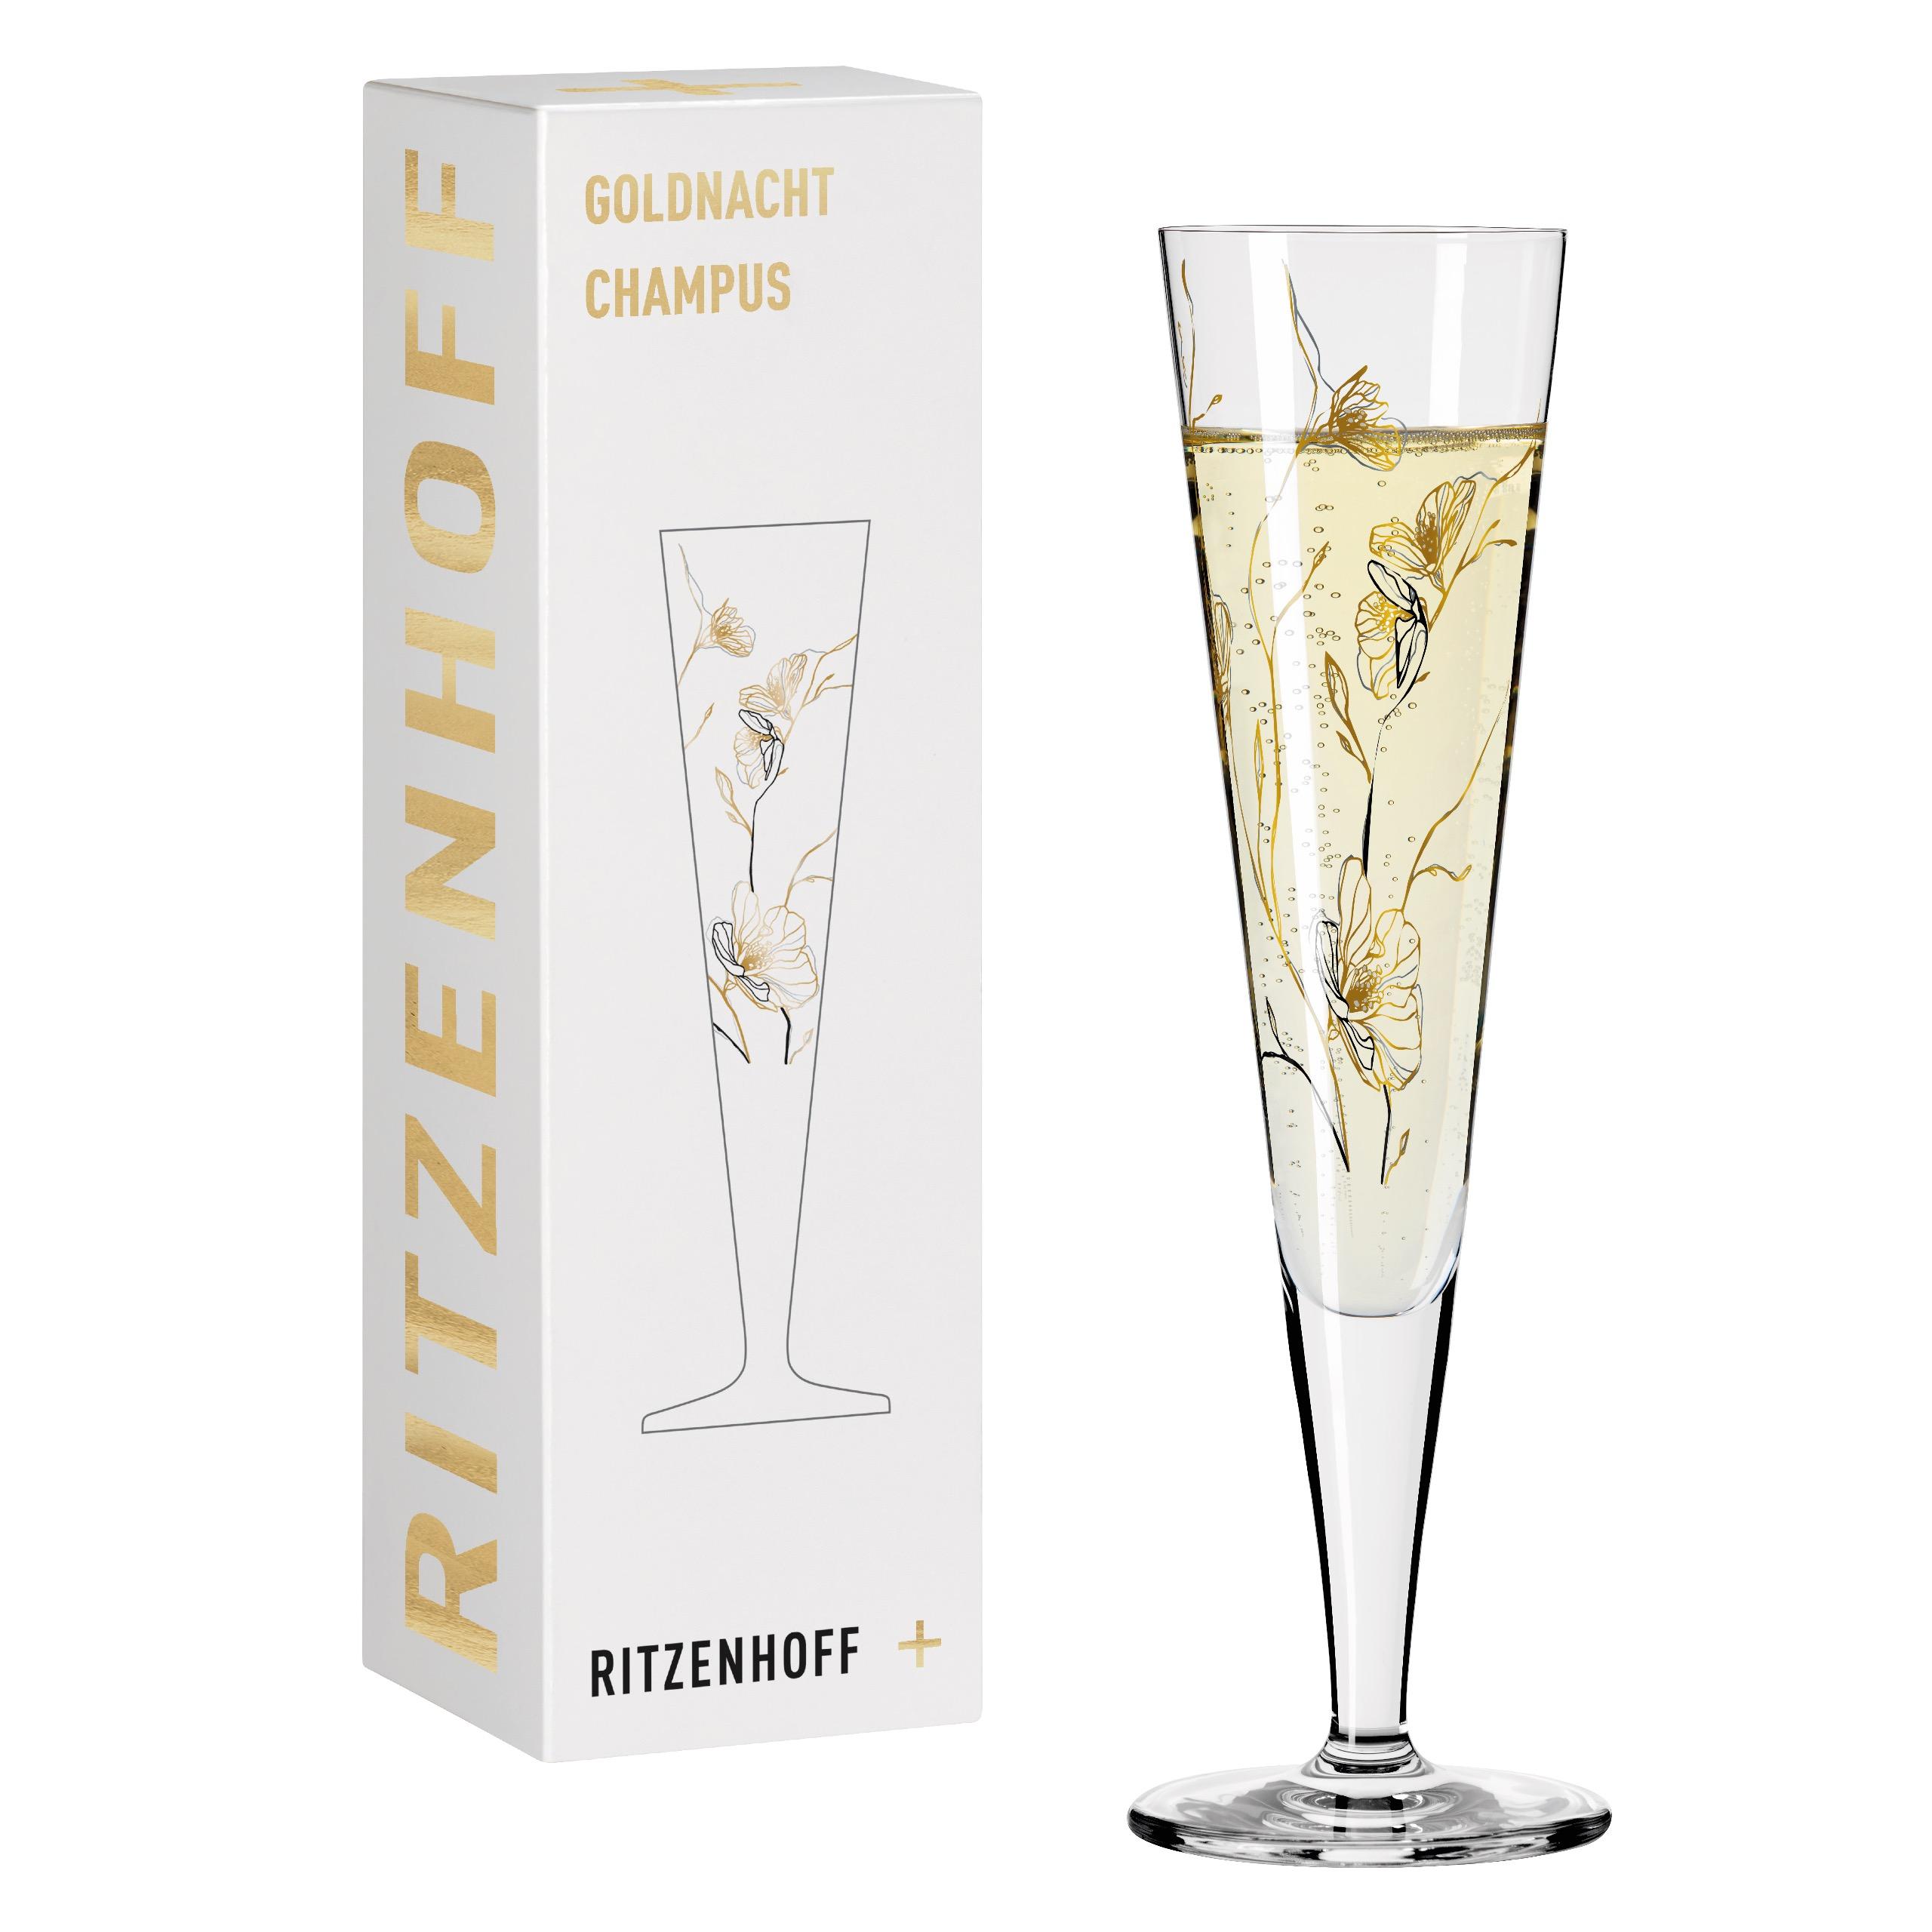 Ritzenhoff Goldnight Champagne Glass Benzoni